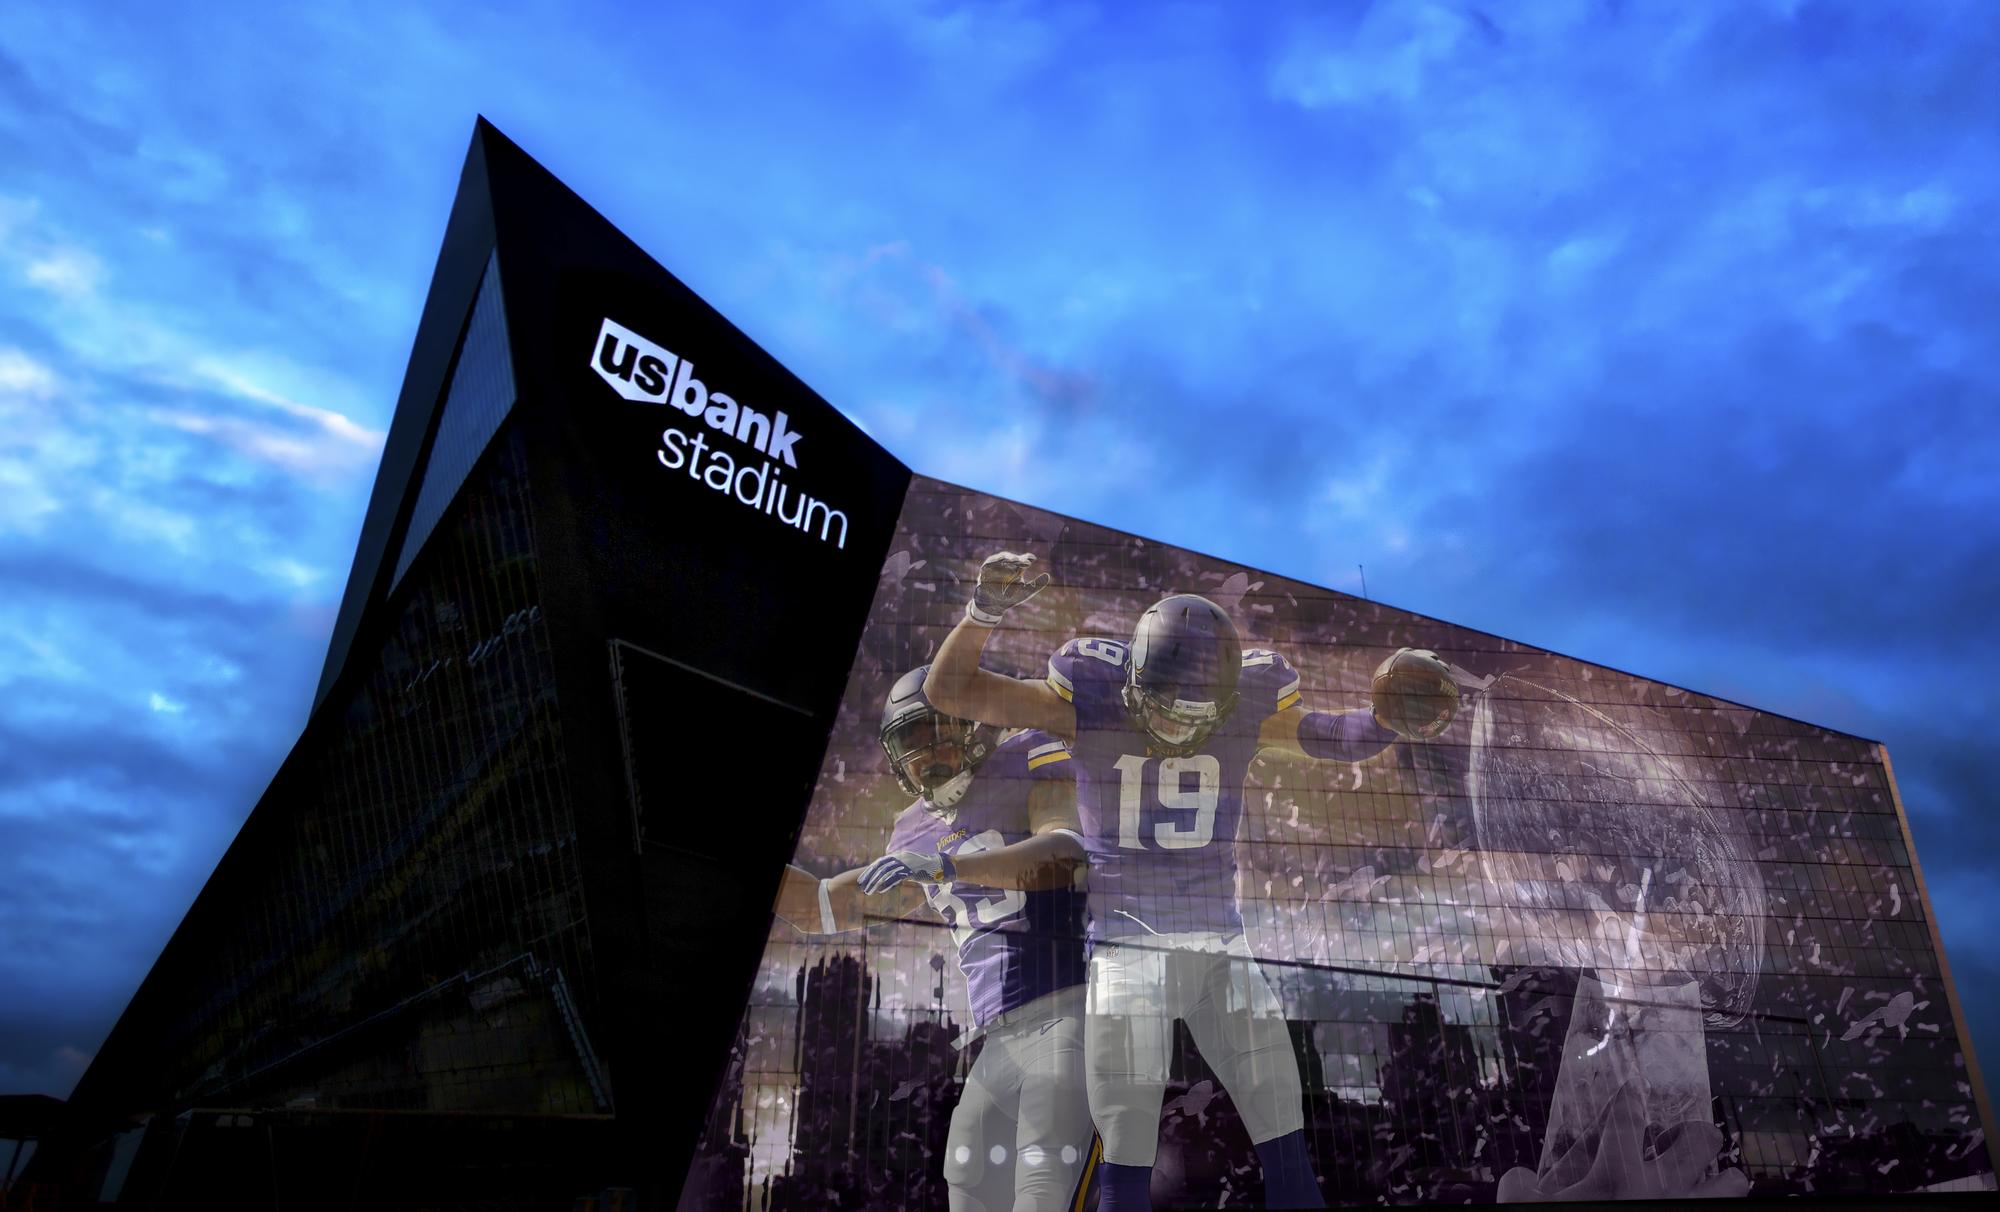 U.S. Bank Stadium di Minneapolis, Minnesota